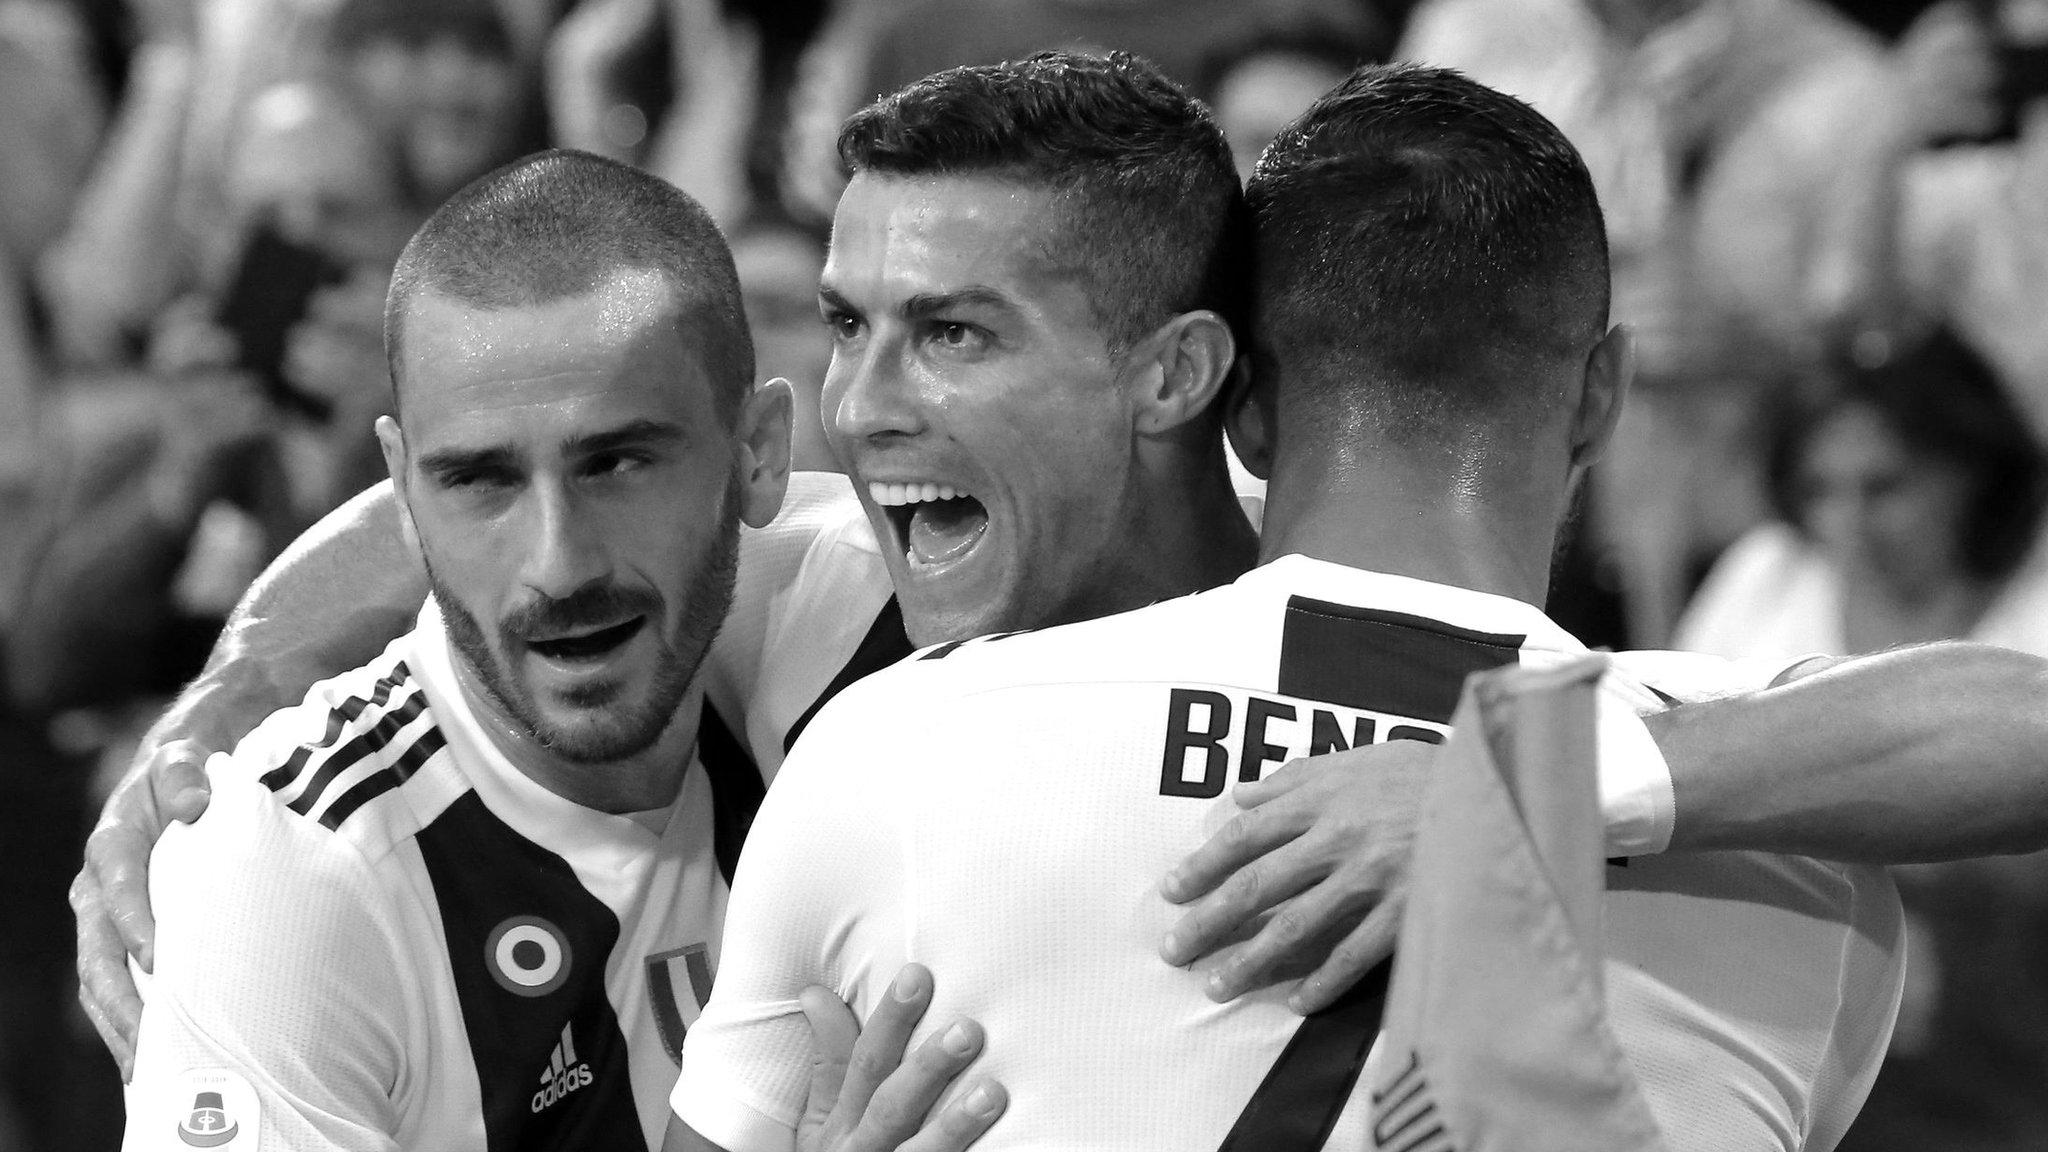 Man Utd v Juventus: Cristiano Ronaldo returns as Juve target European glory